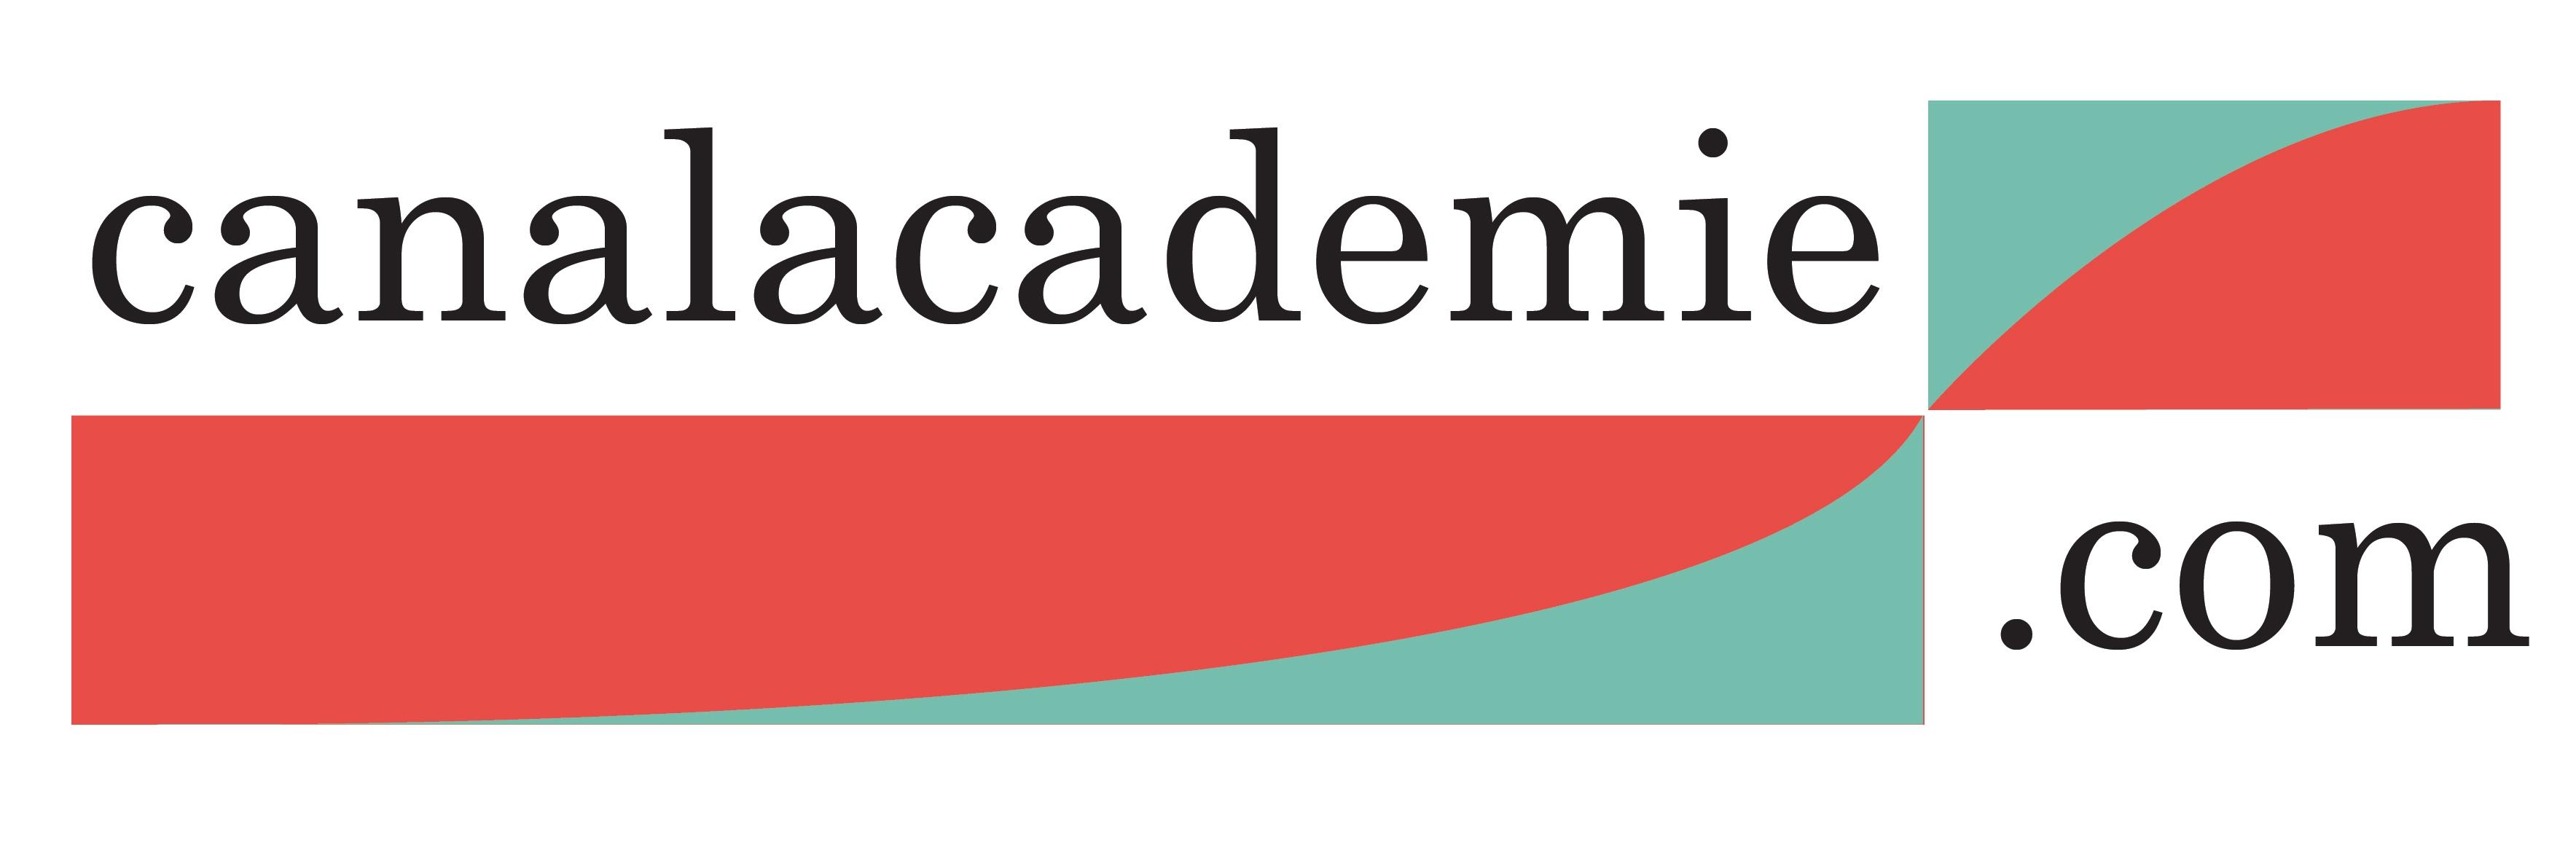 http://www.fondationostadelahi.fr/wp-content/upload/logo-Canal-académie.jpg